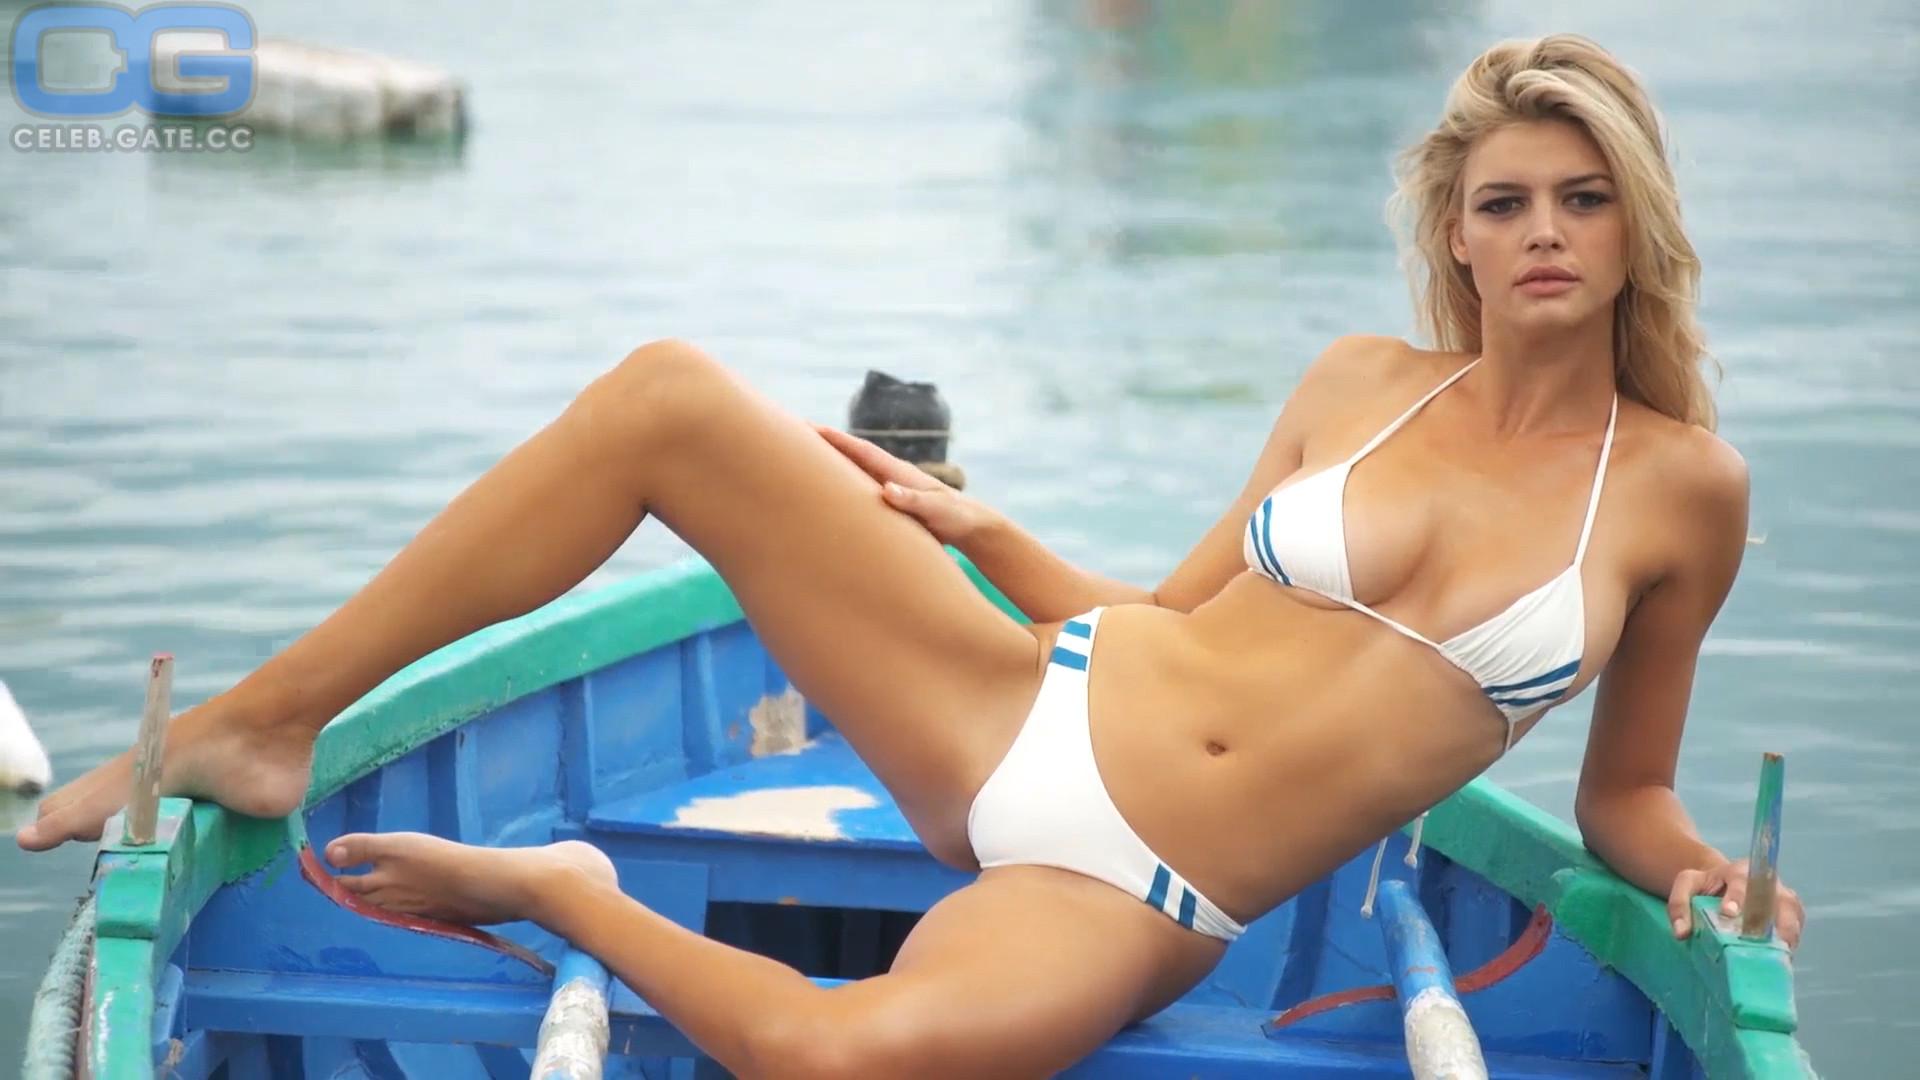 Rohrbach nackt bilder kelly 41 Sexiest